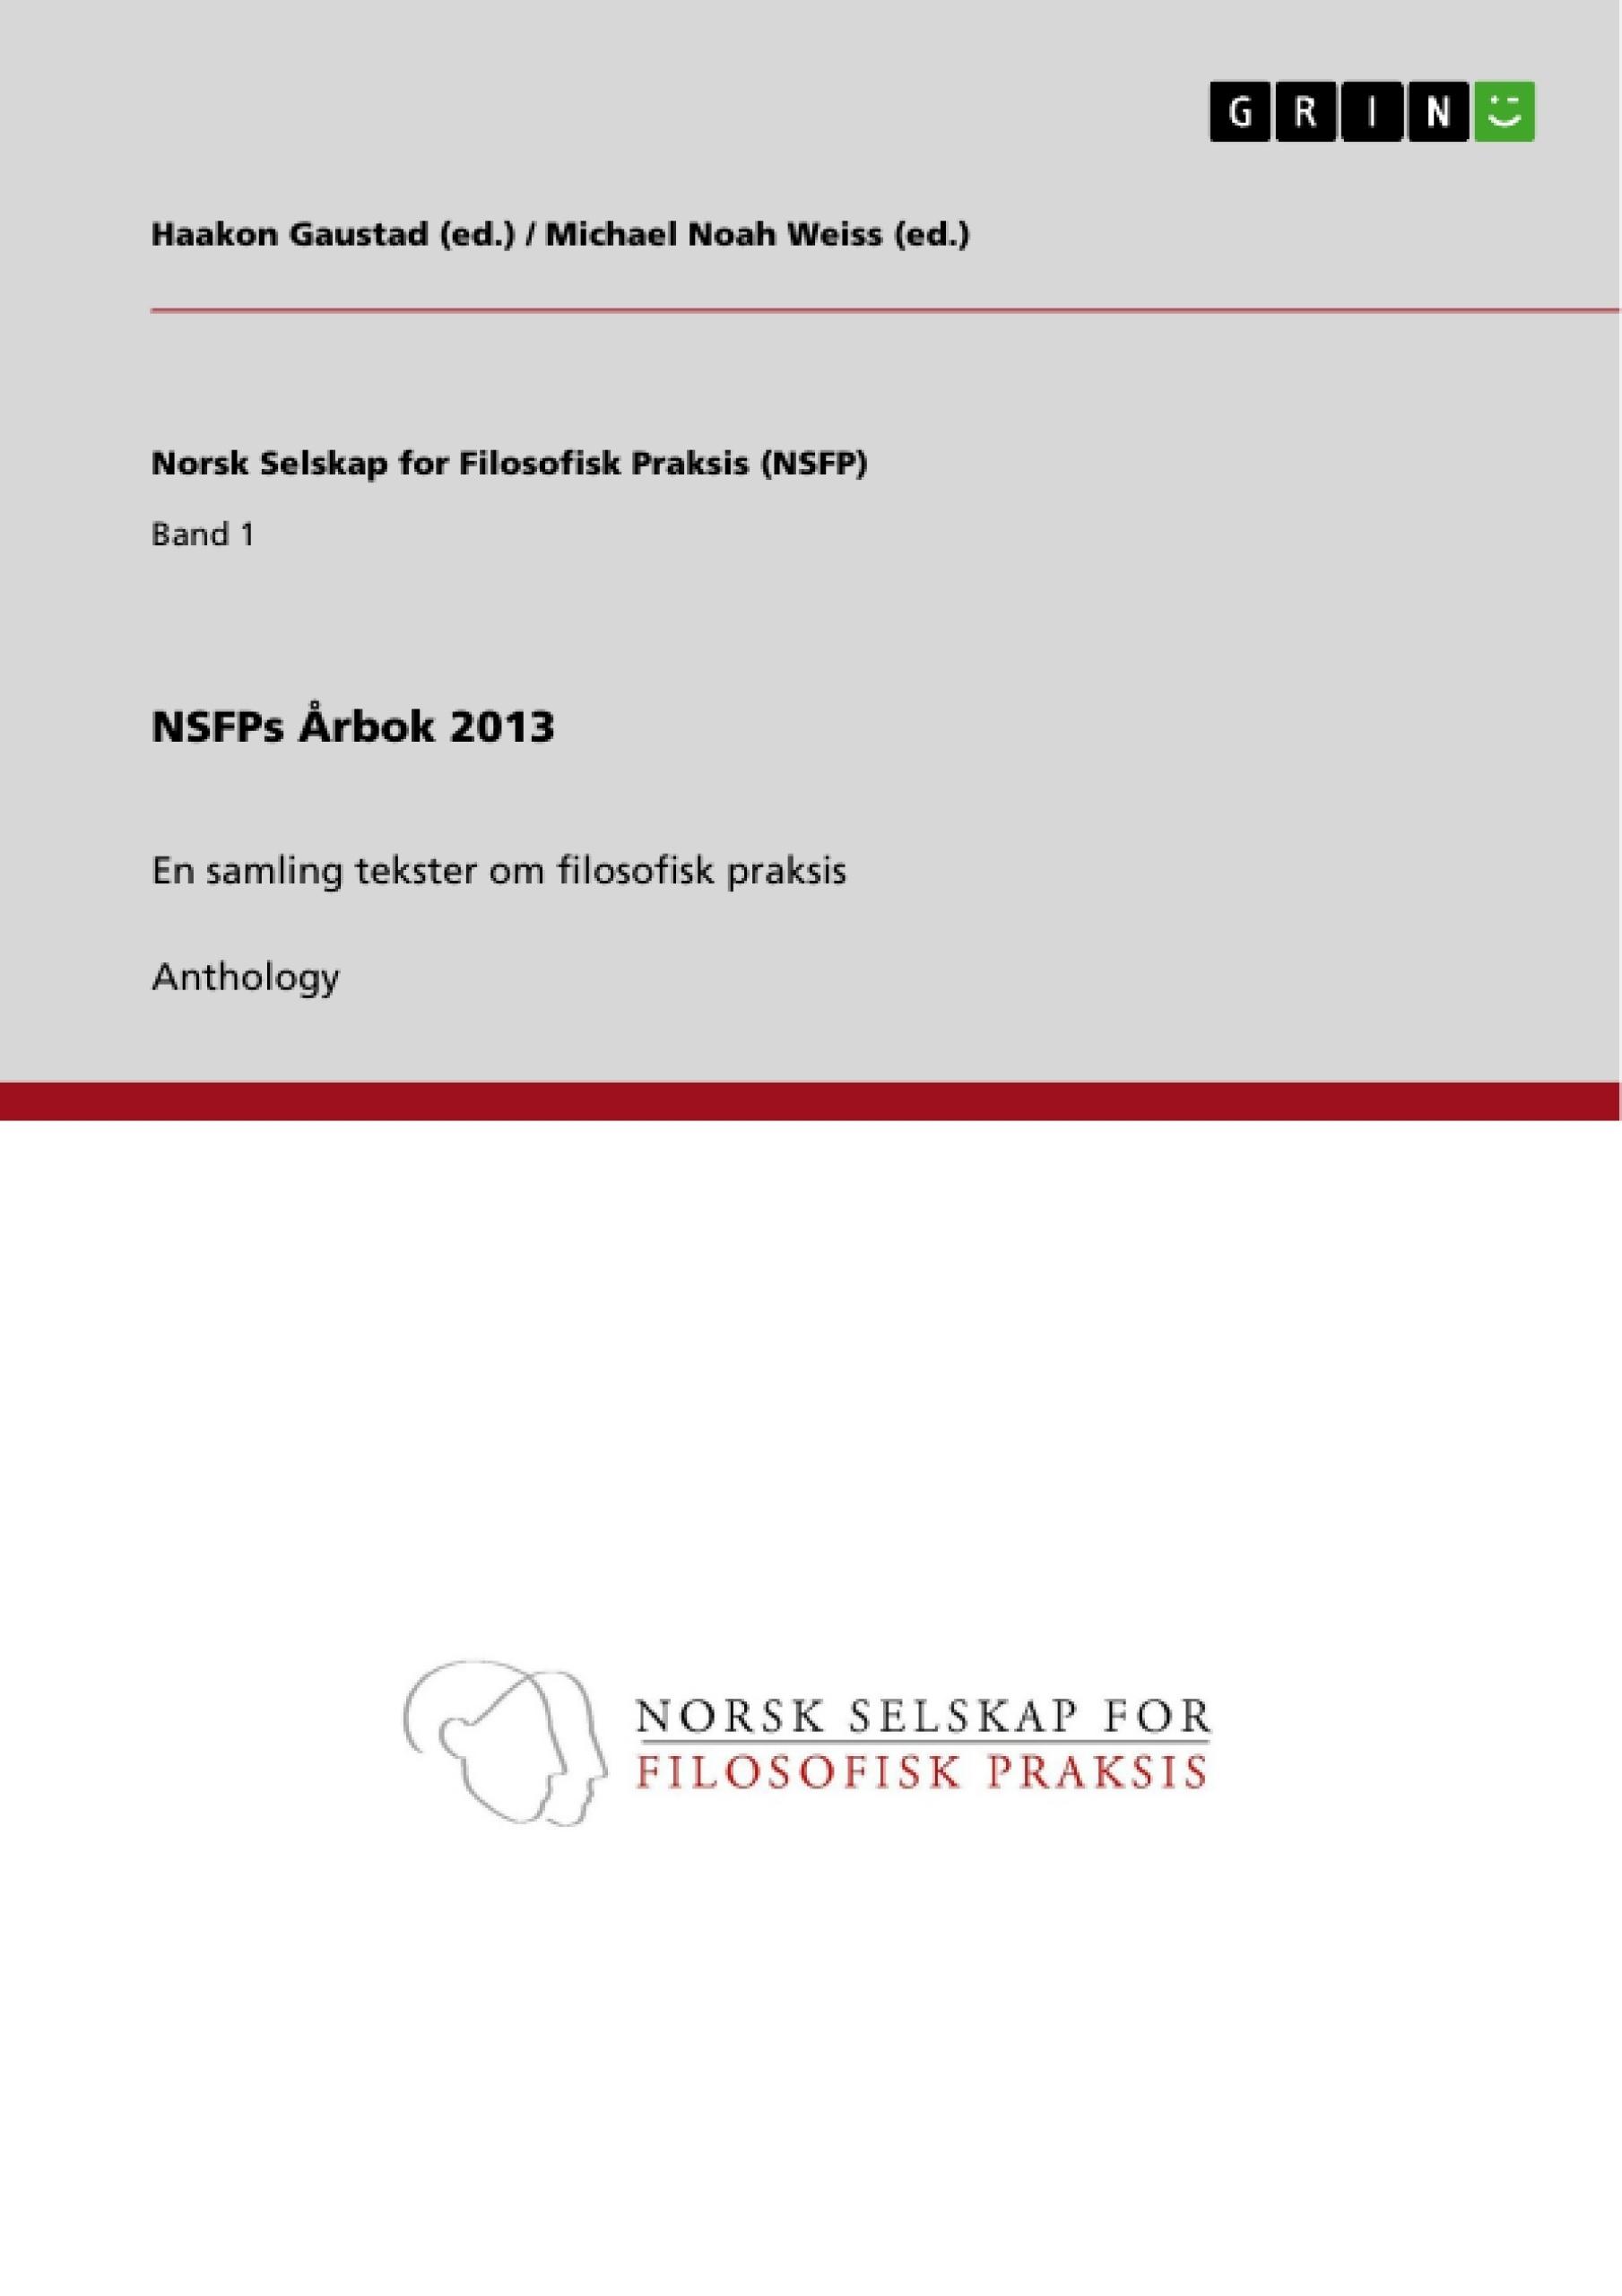 Título: NSFPs Årbok 2013